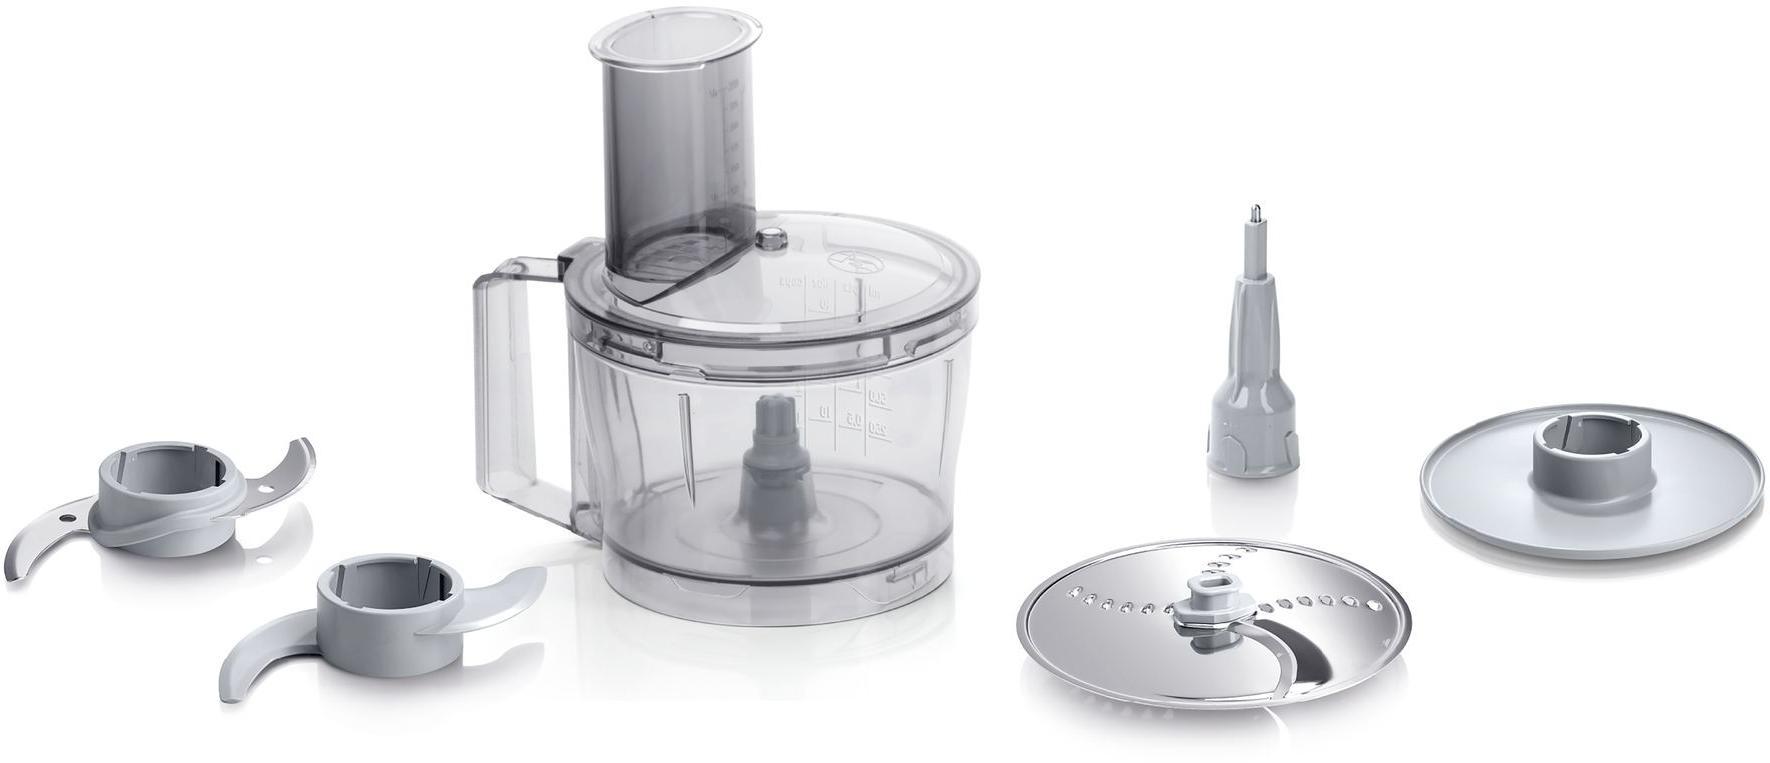 Best Bosch Küchenmaschine Profi 67 Images - Milbank.us - milbank.us